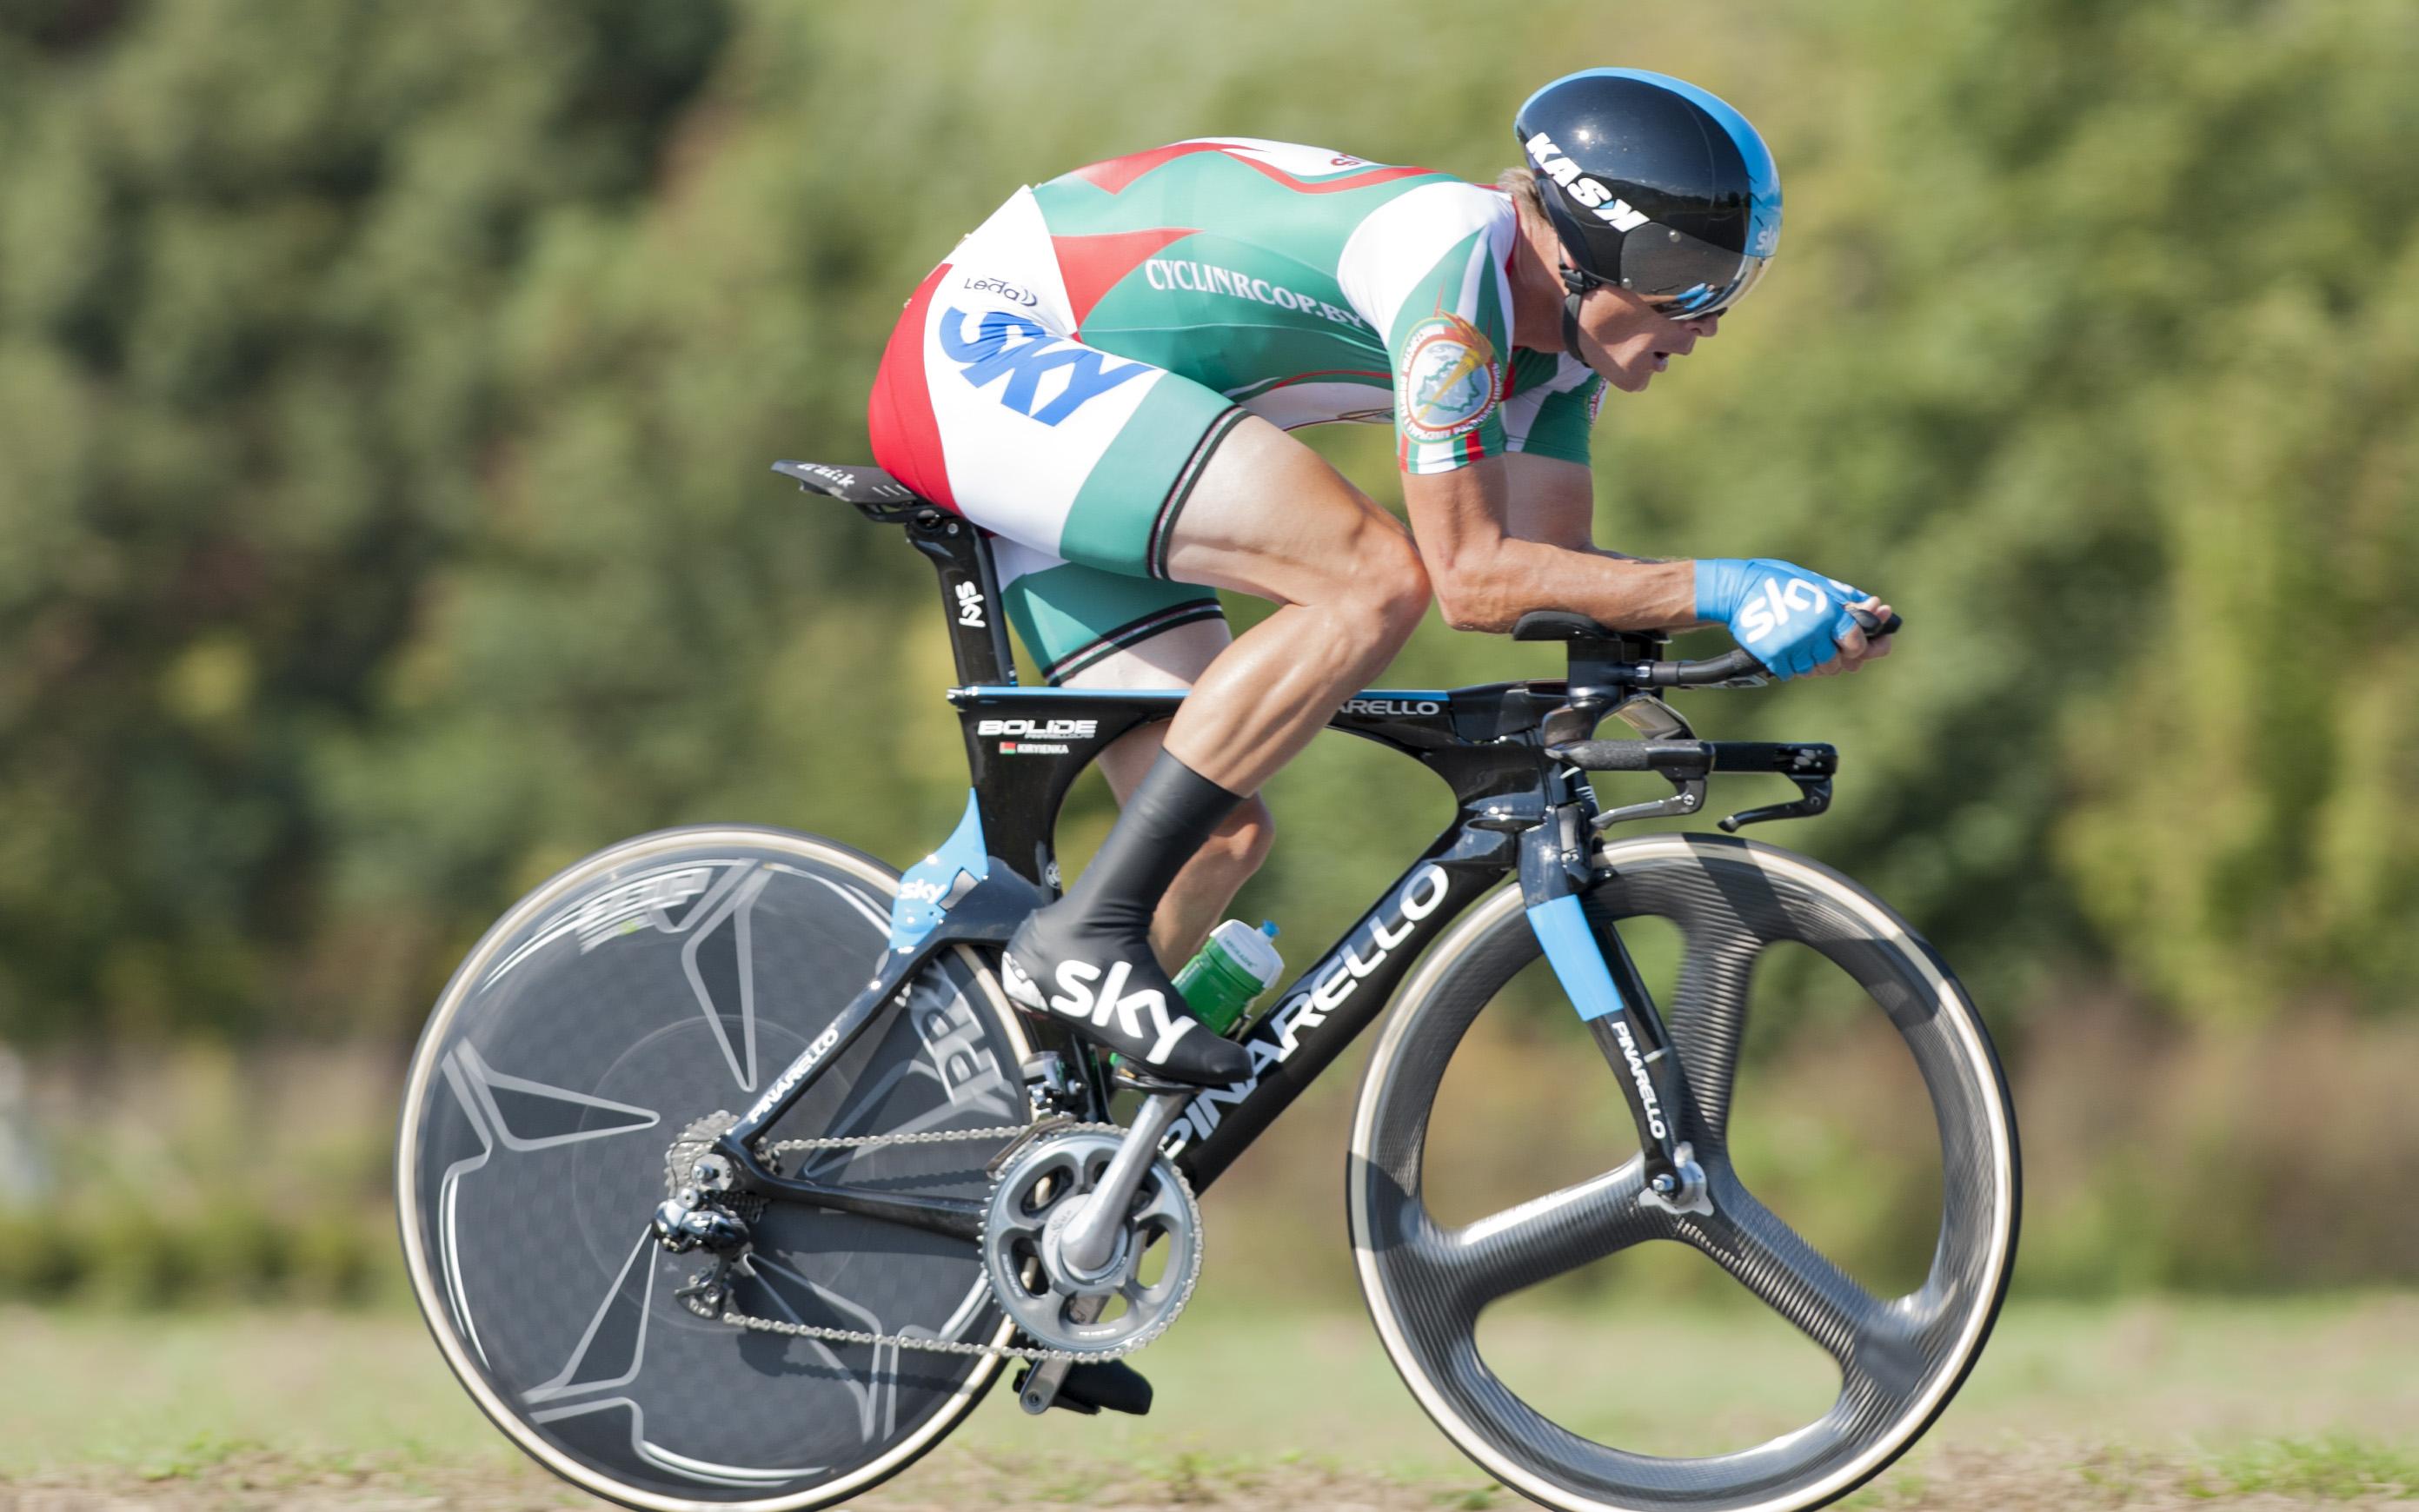 ¿Recurrió el ciclista Vasil Kiryienka al dopaje mecánico?